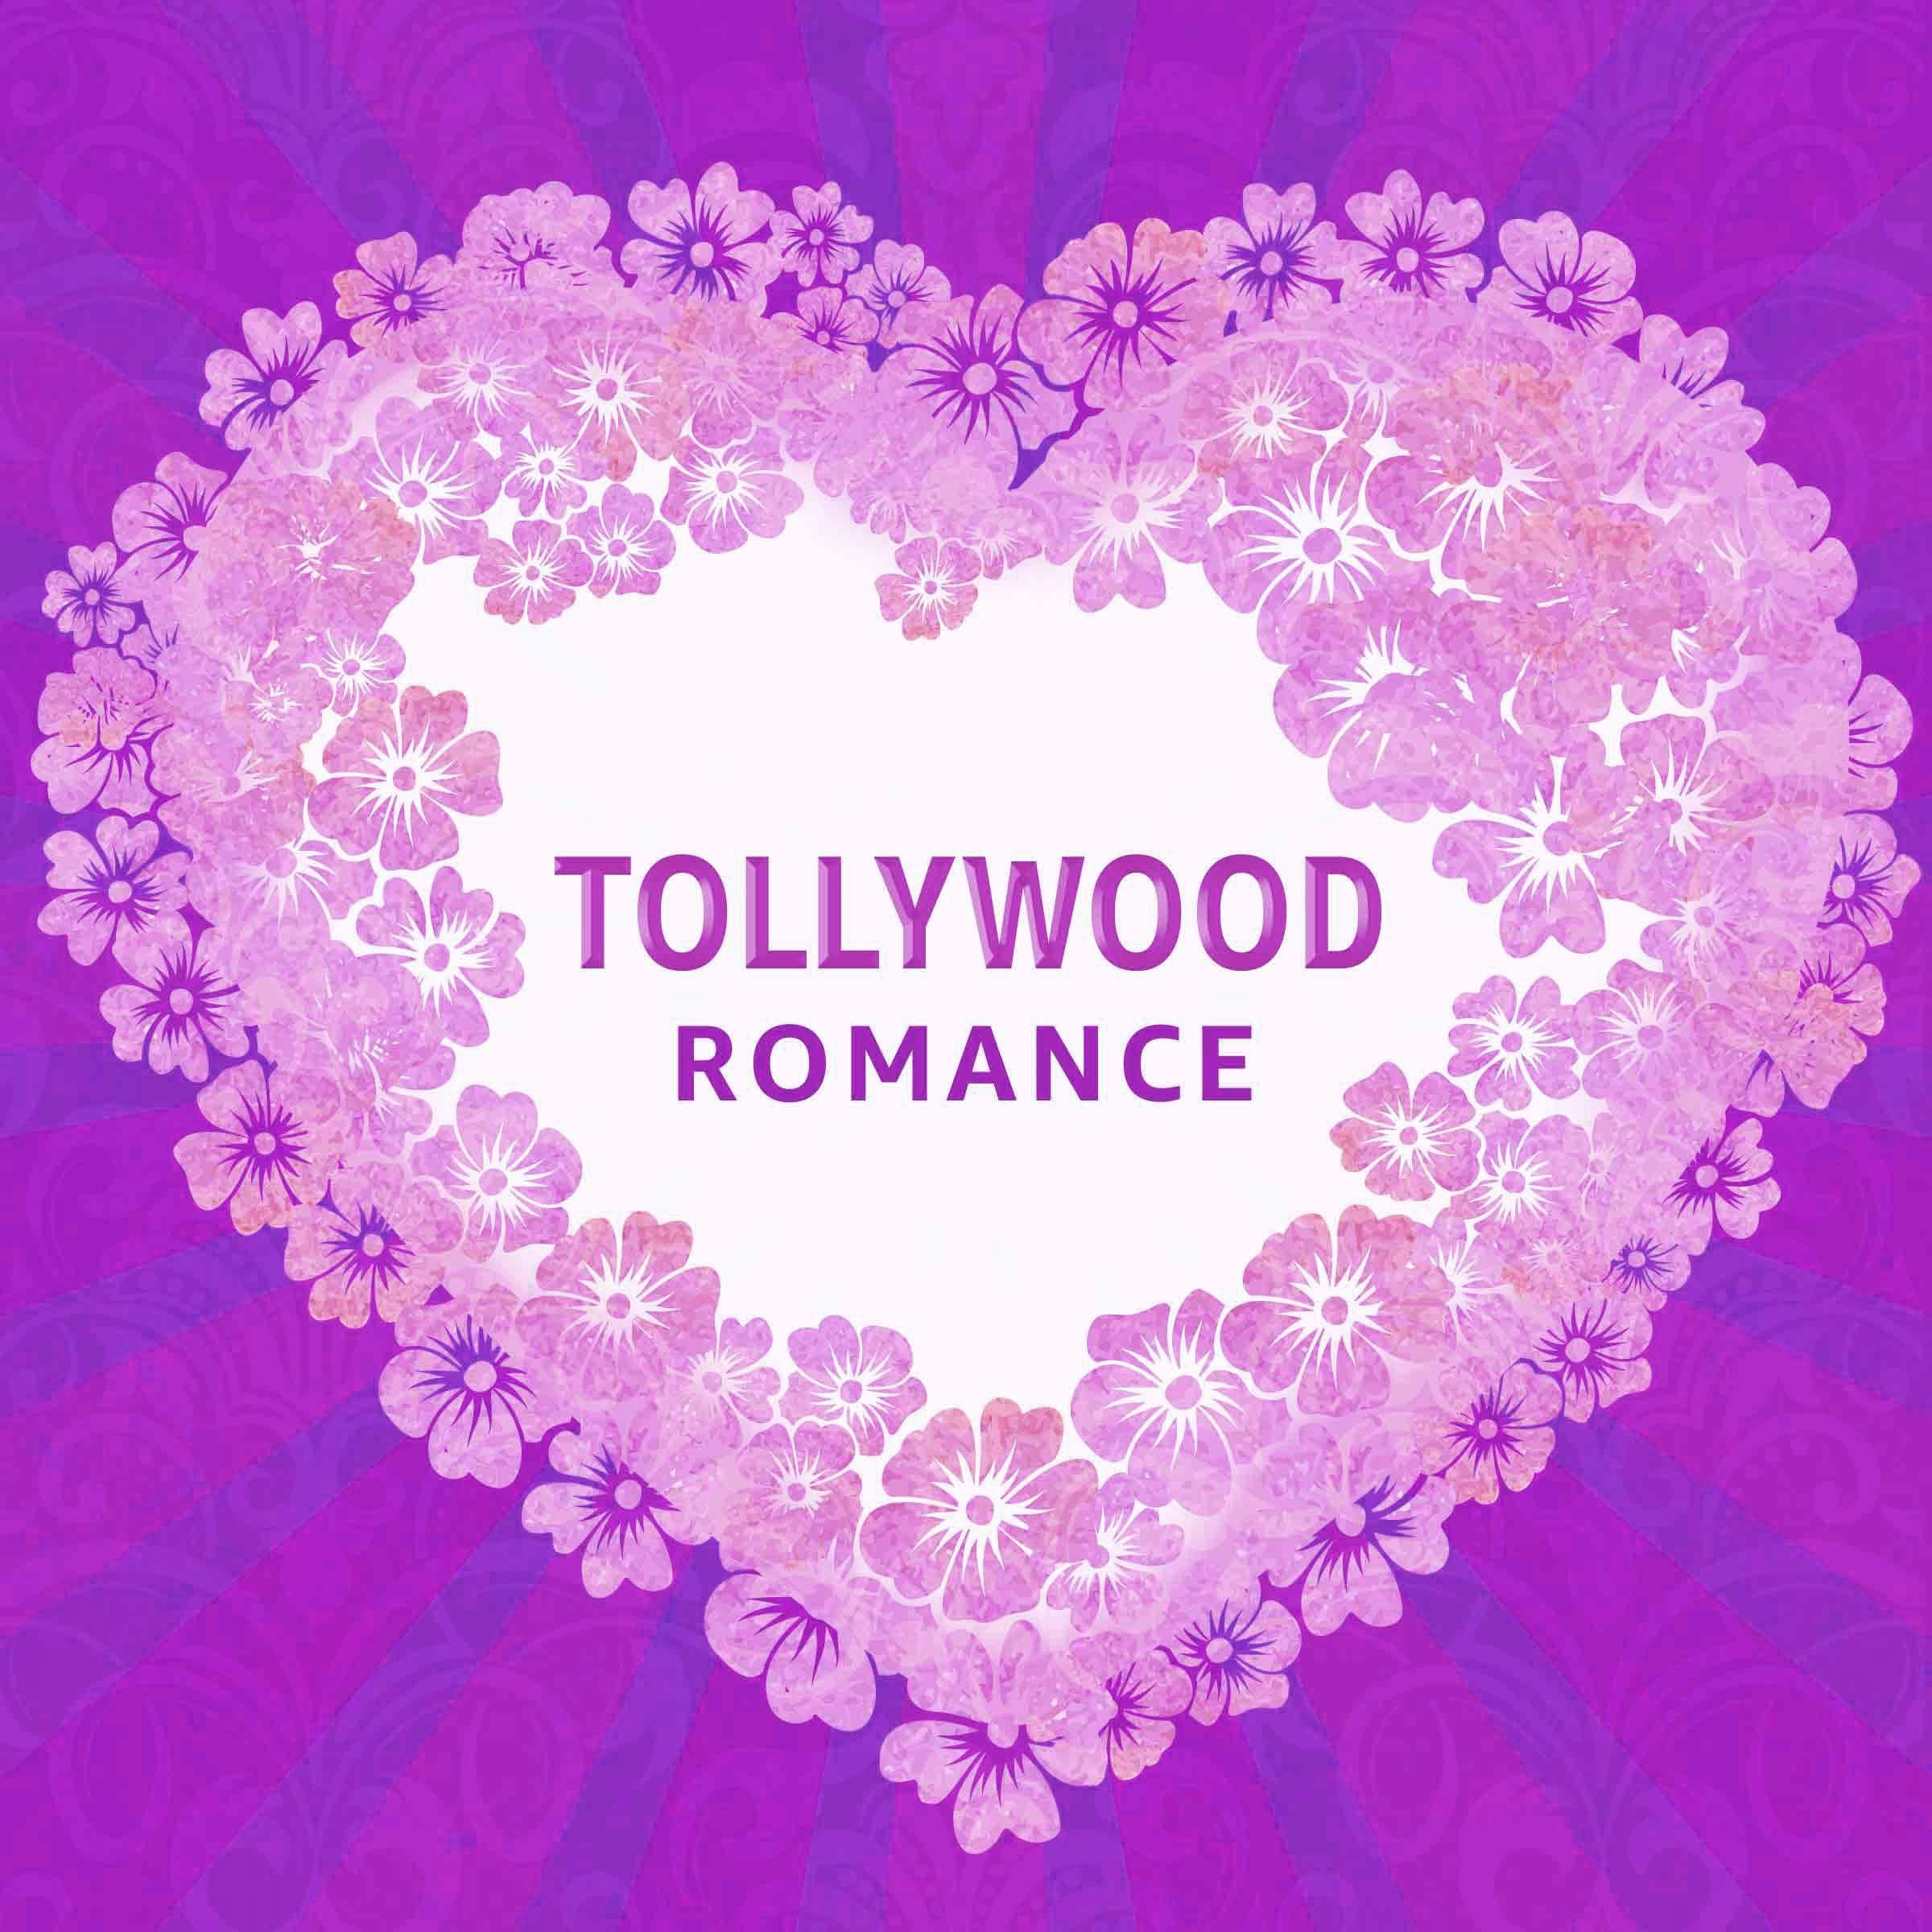 Tollywood Romance